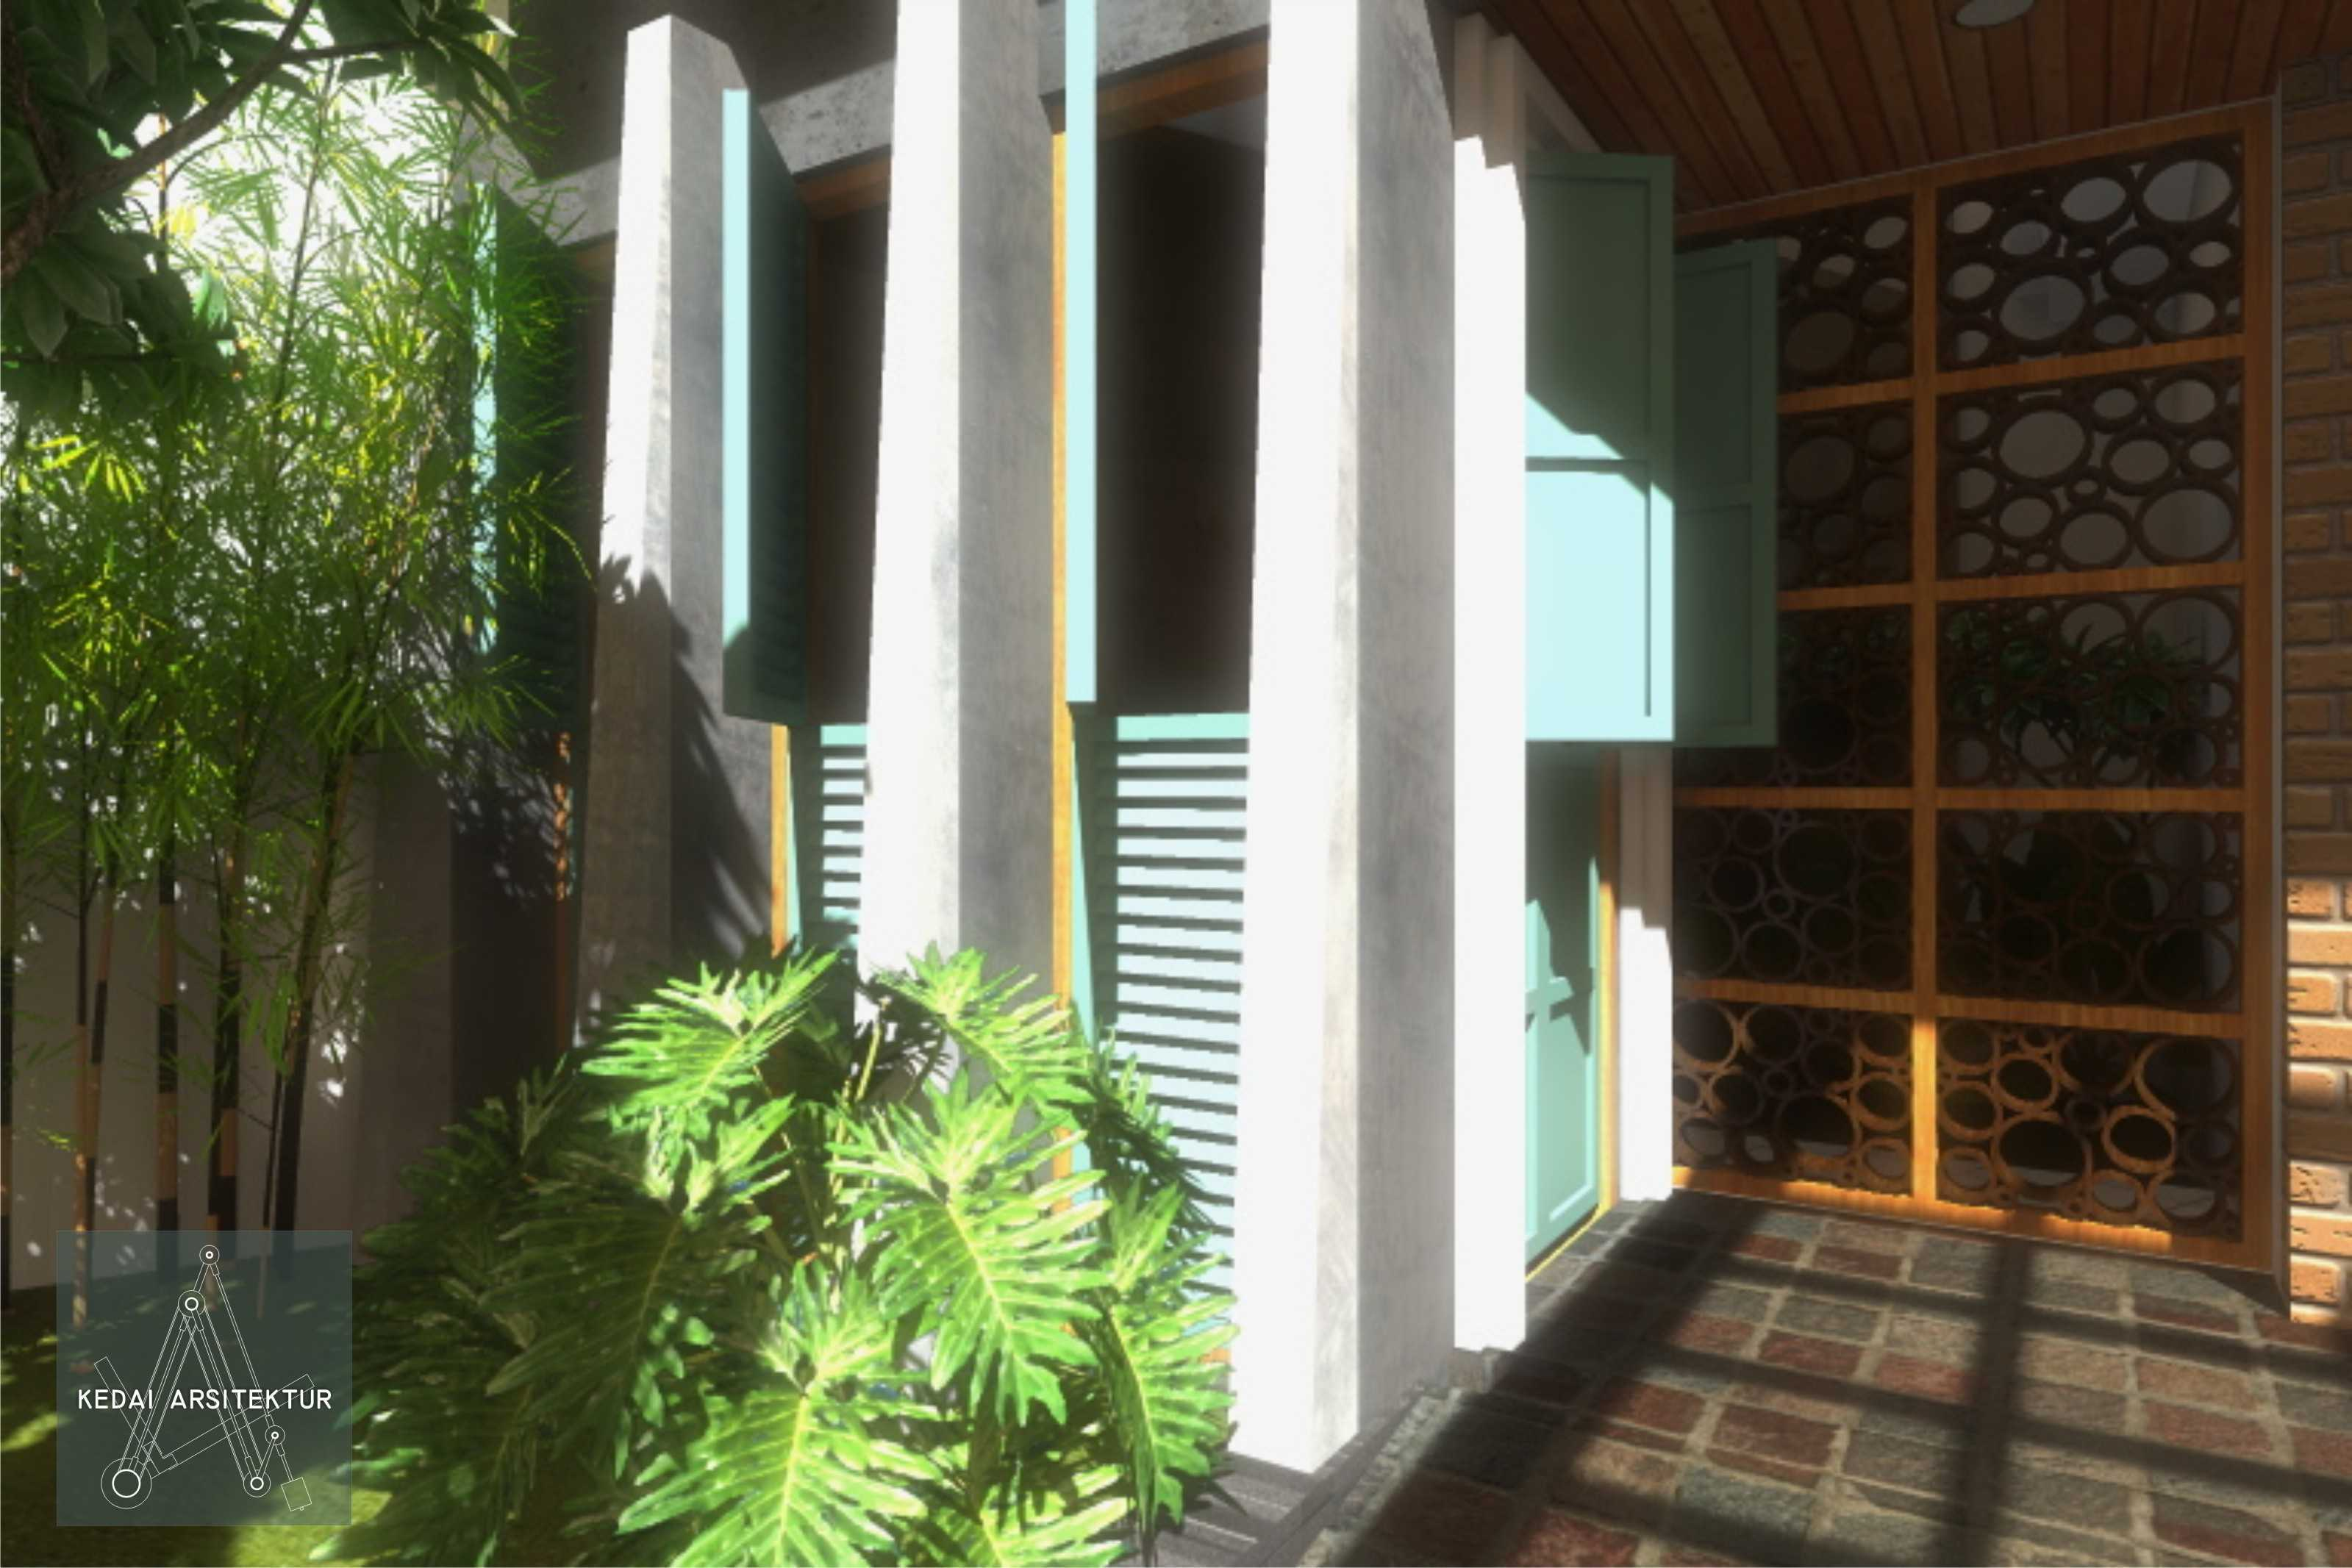 Kedai.arsitektur Rumah Puri Bali-5 Bojongsari, Kota Depok, Jawa Barat, Indonesia  Rmh-Puri-Bali-5-Image-4 Industrial  35889